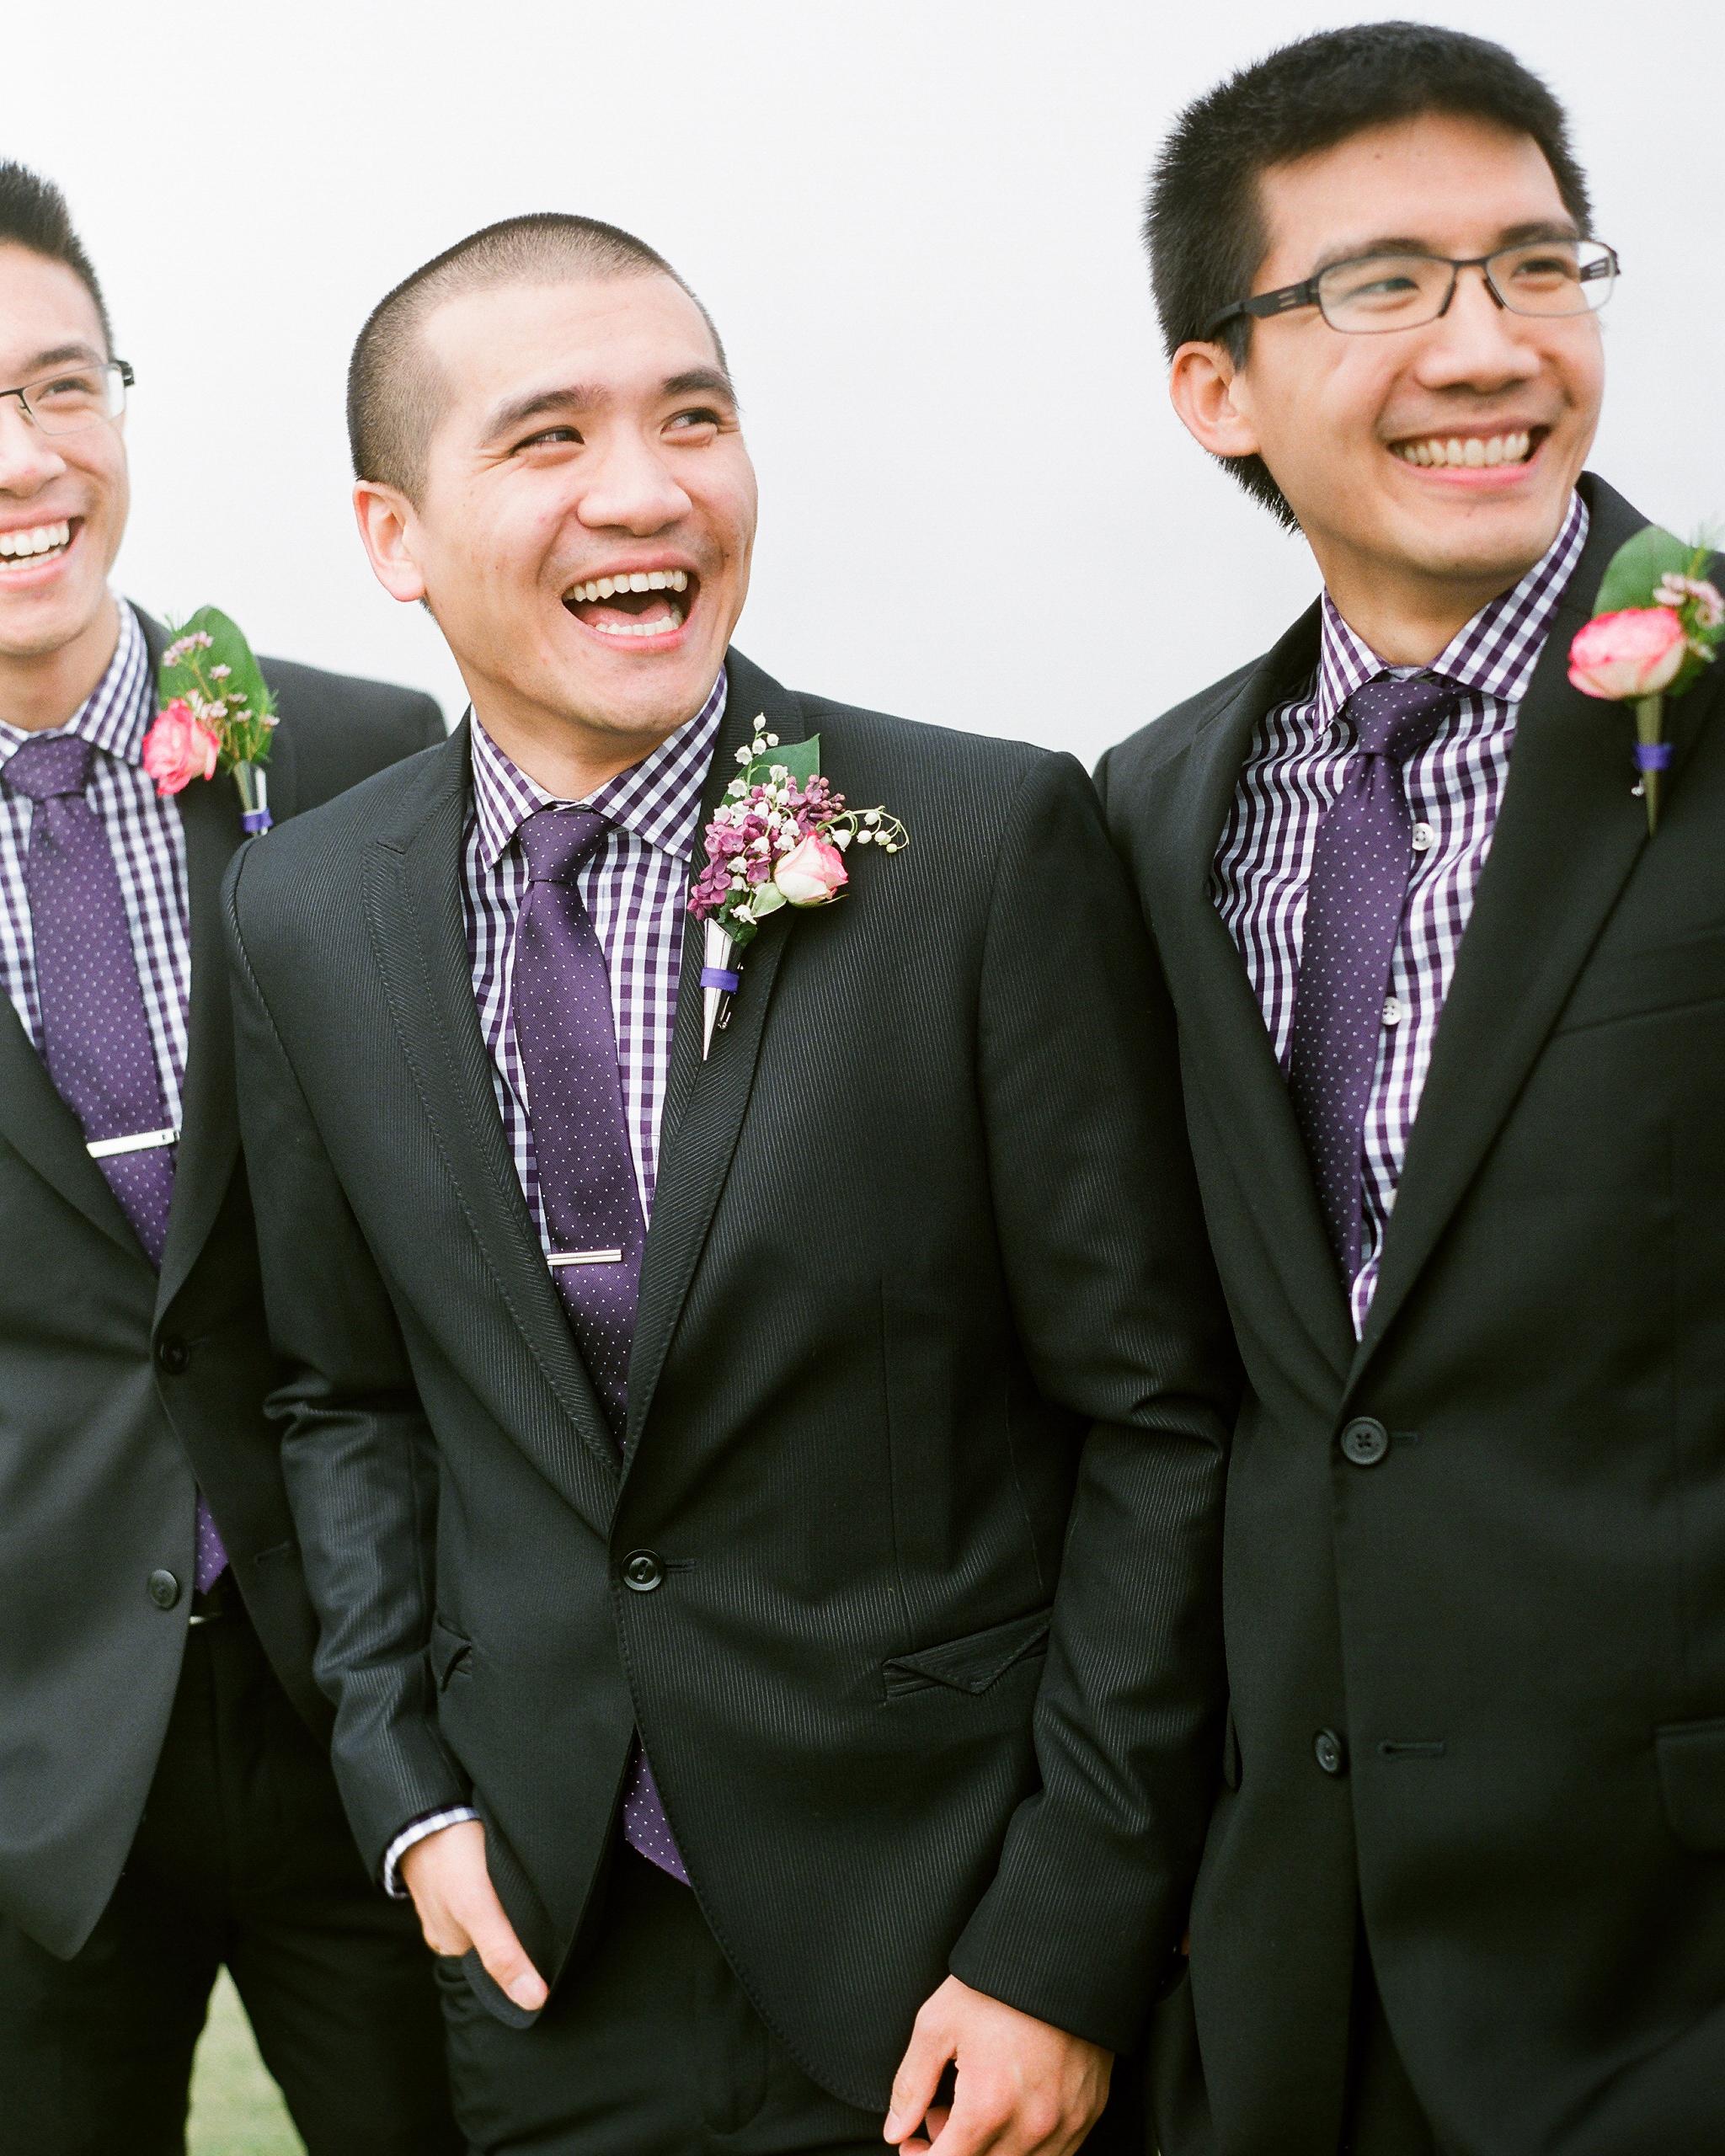 libby-allen-wedding-groomsmen-056-s112487-0116.jpg